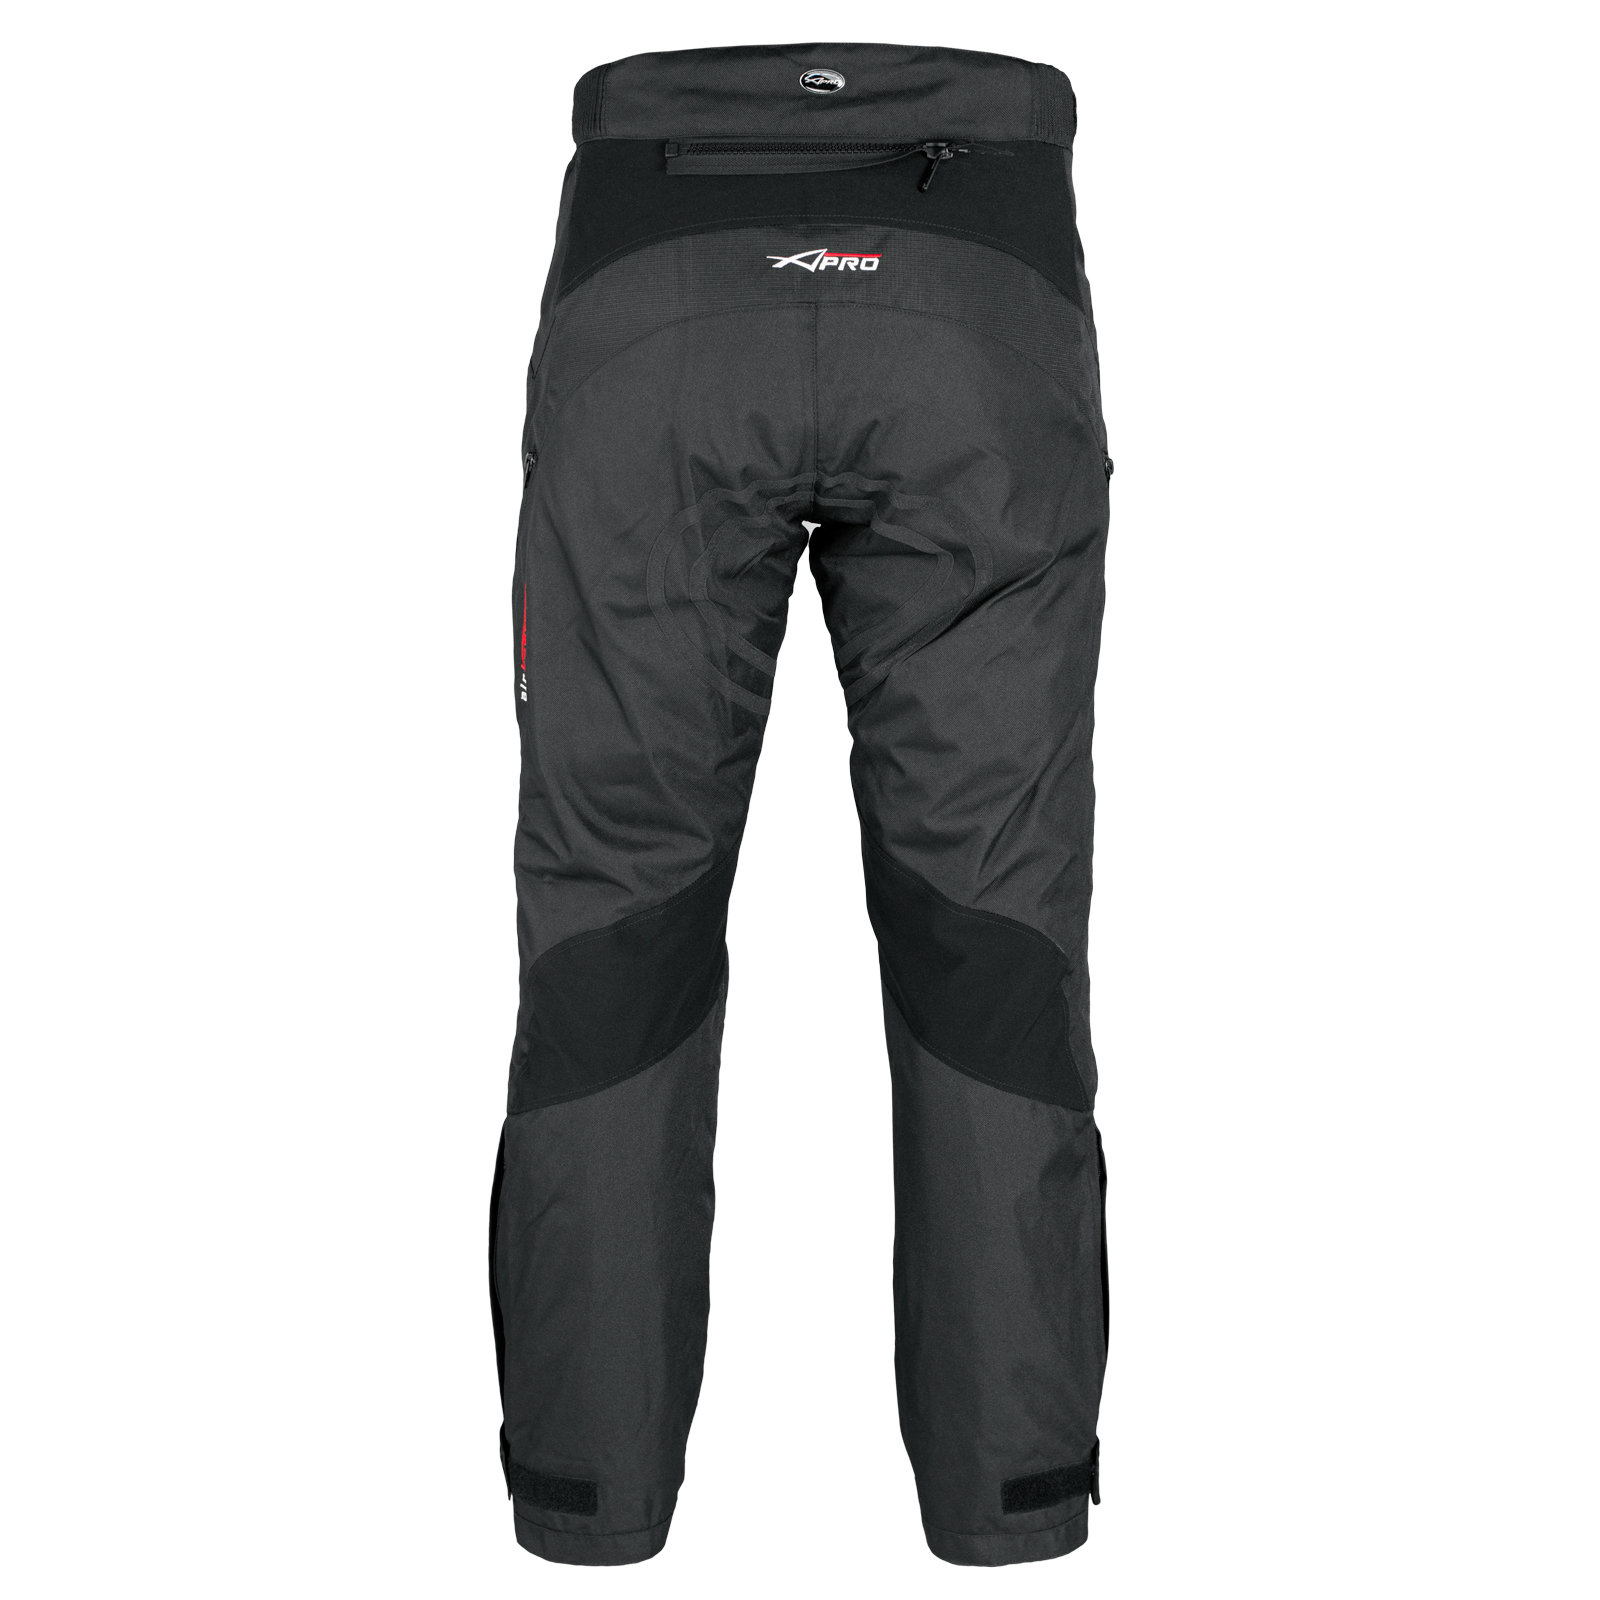 miniatuur 5 - Pantaloni Impermeabile Moto Imbottitura Termica Estraibile Traspirante Cordura